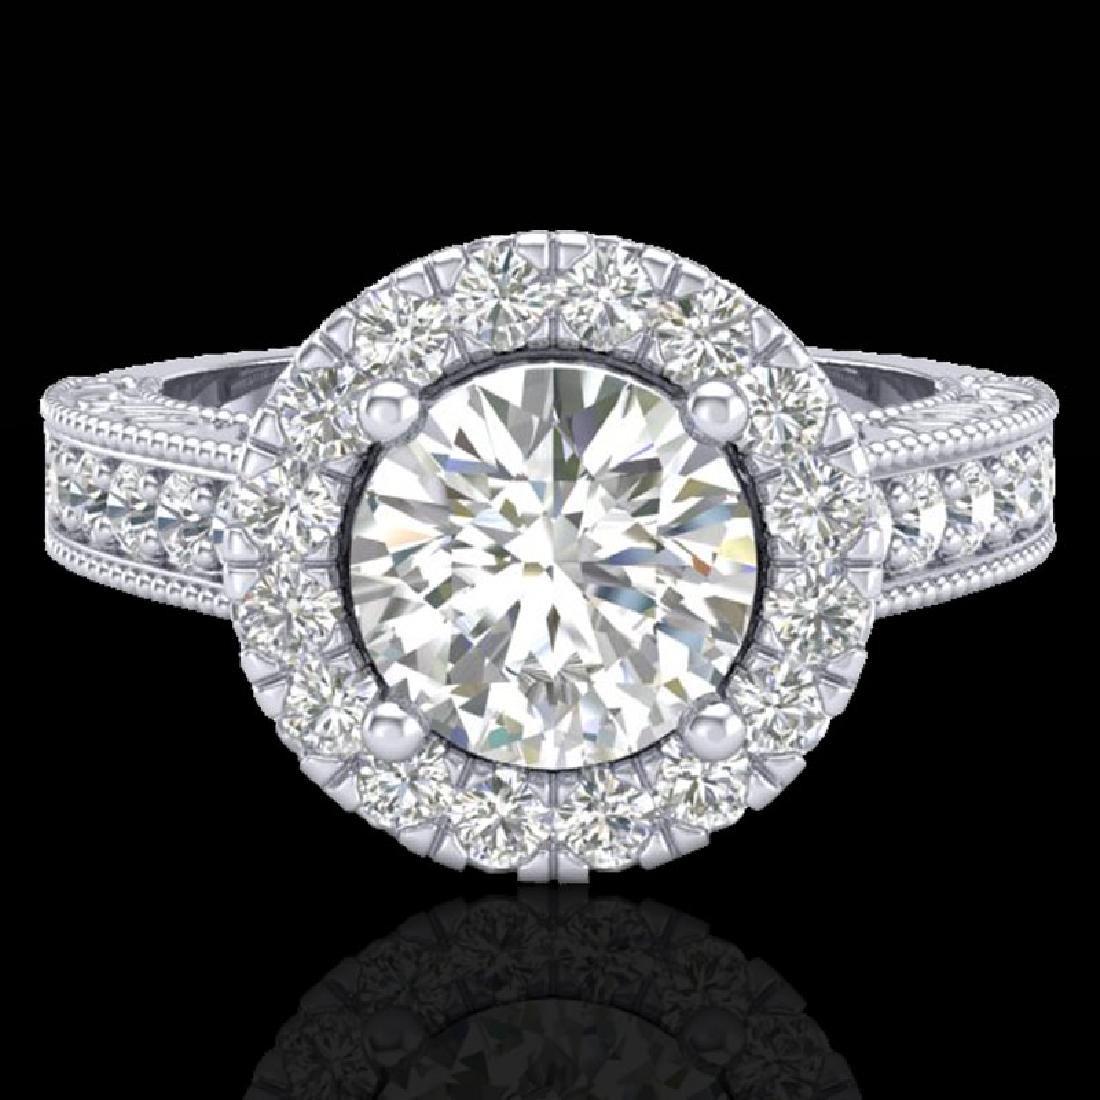 2.25 CTW Vintage Solitaire VS/SI Diamond Halo Ring 14K